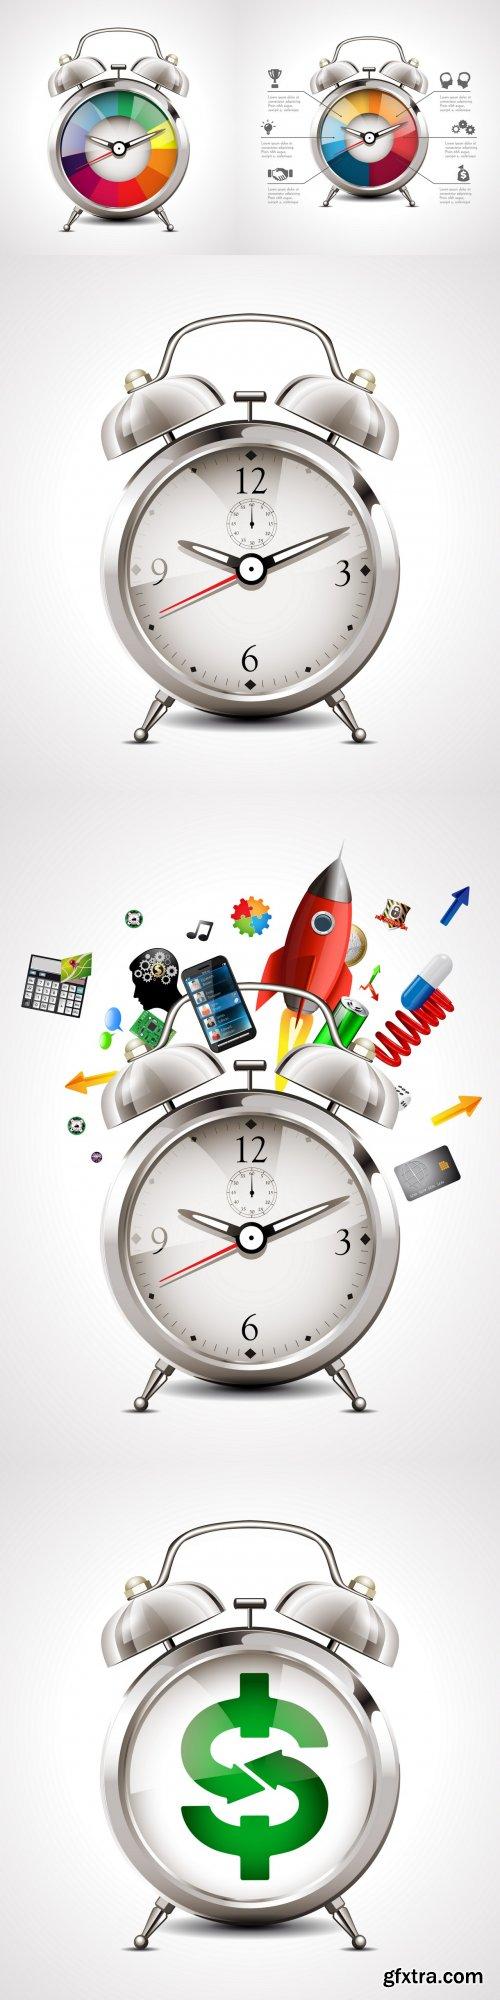 Alarm vector realistic clock